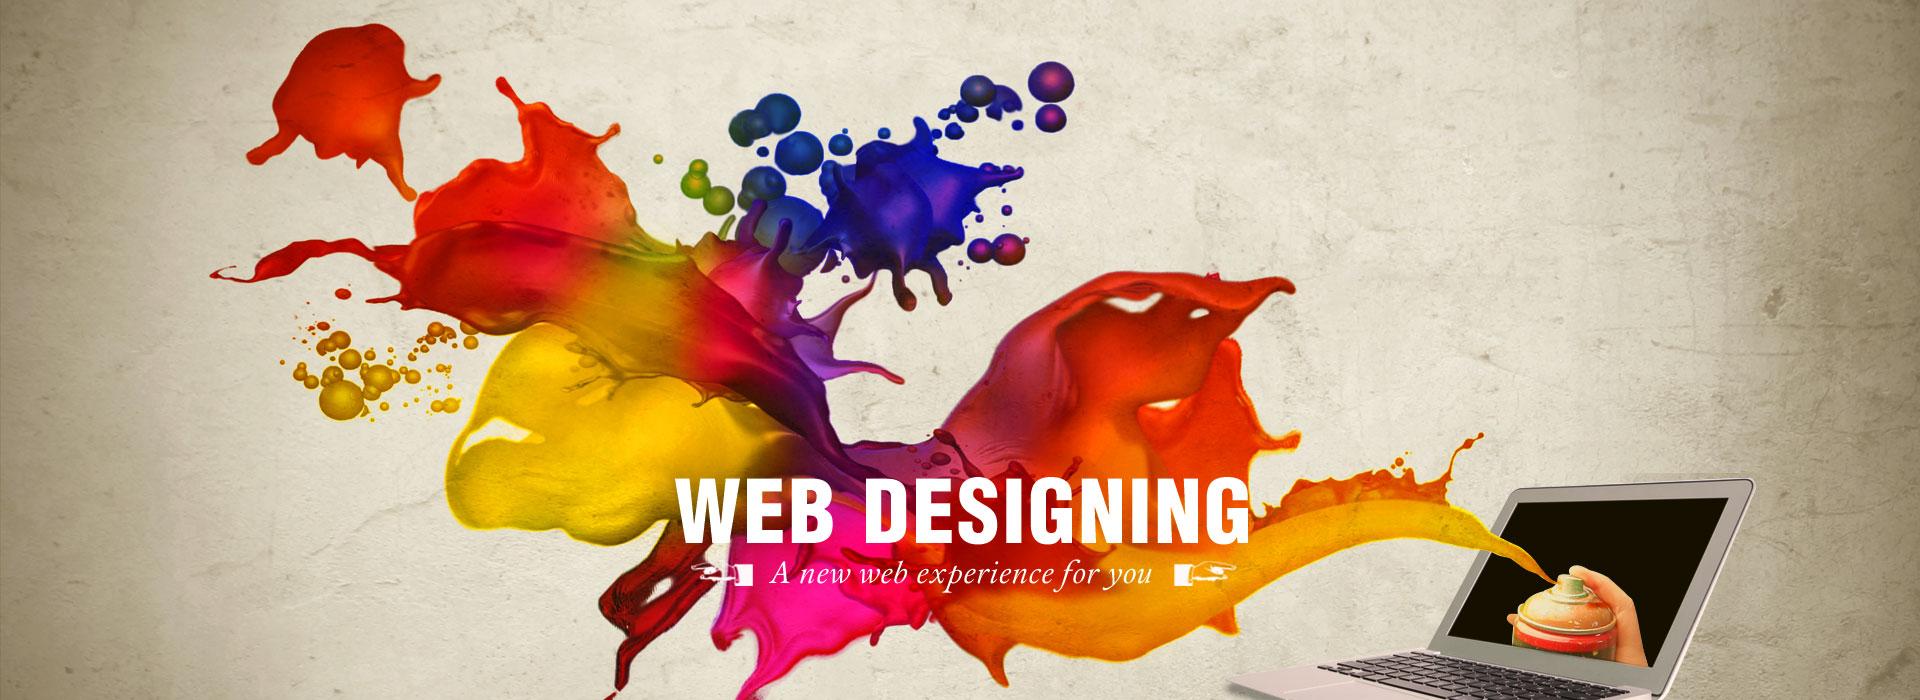 web design online marketing